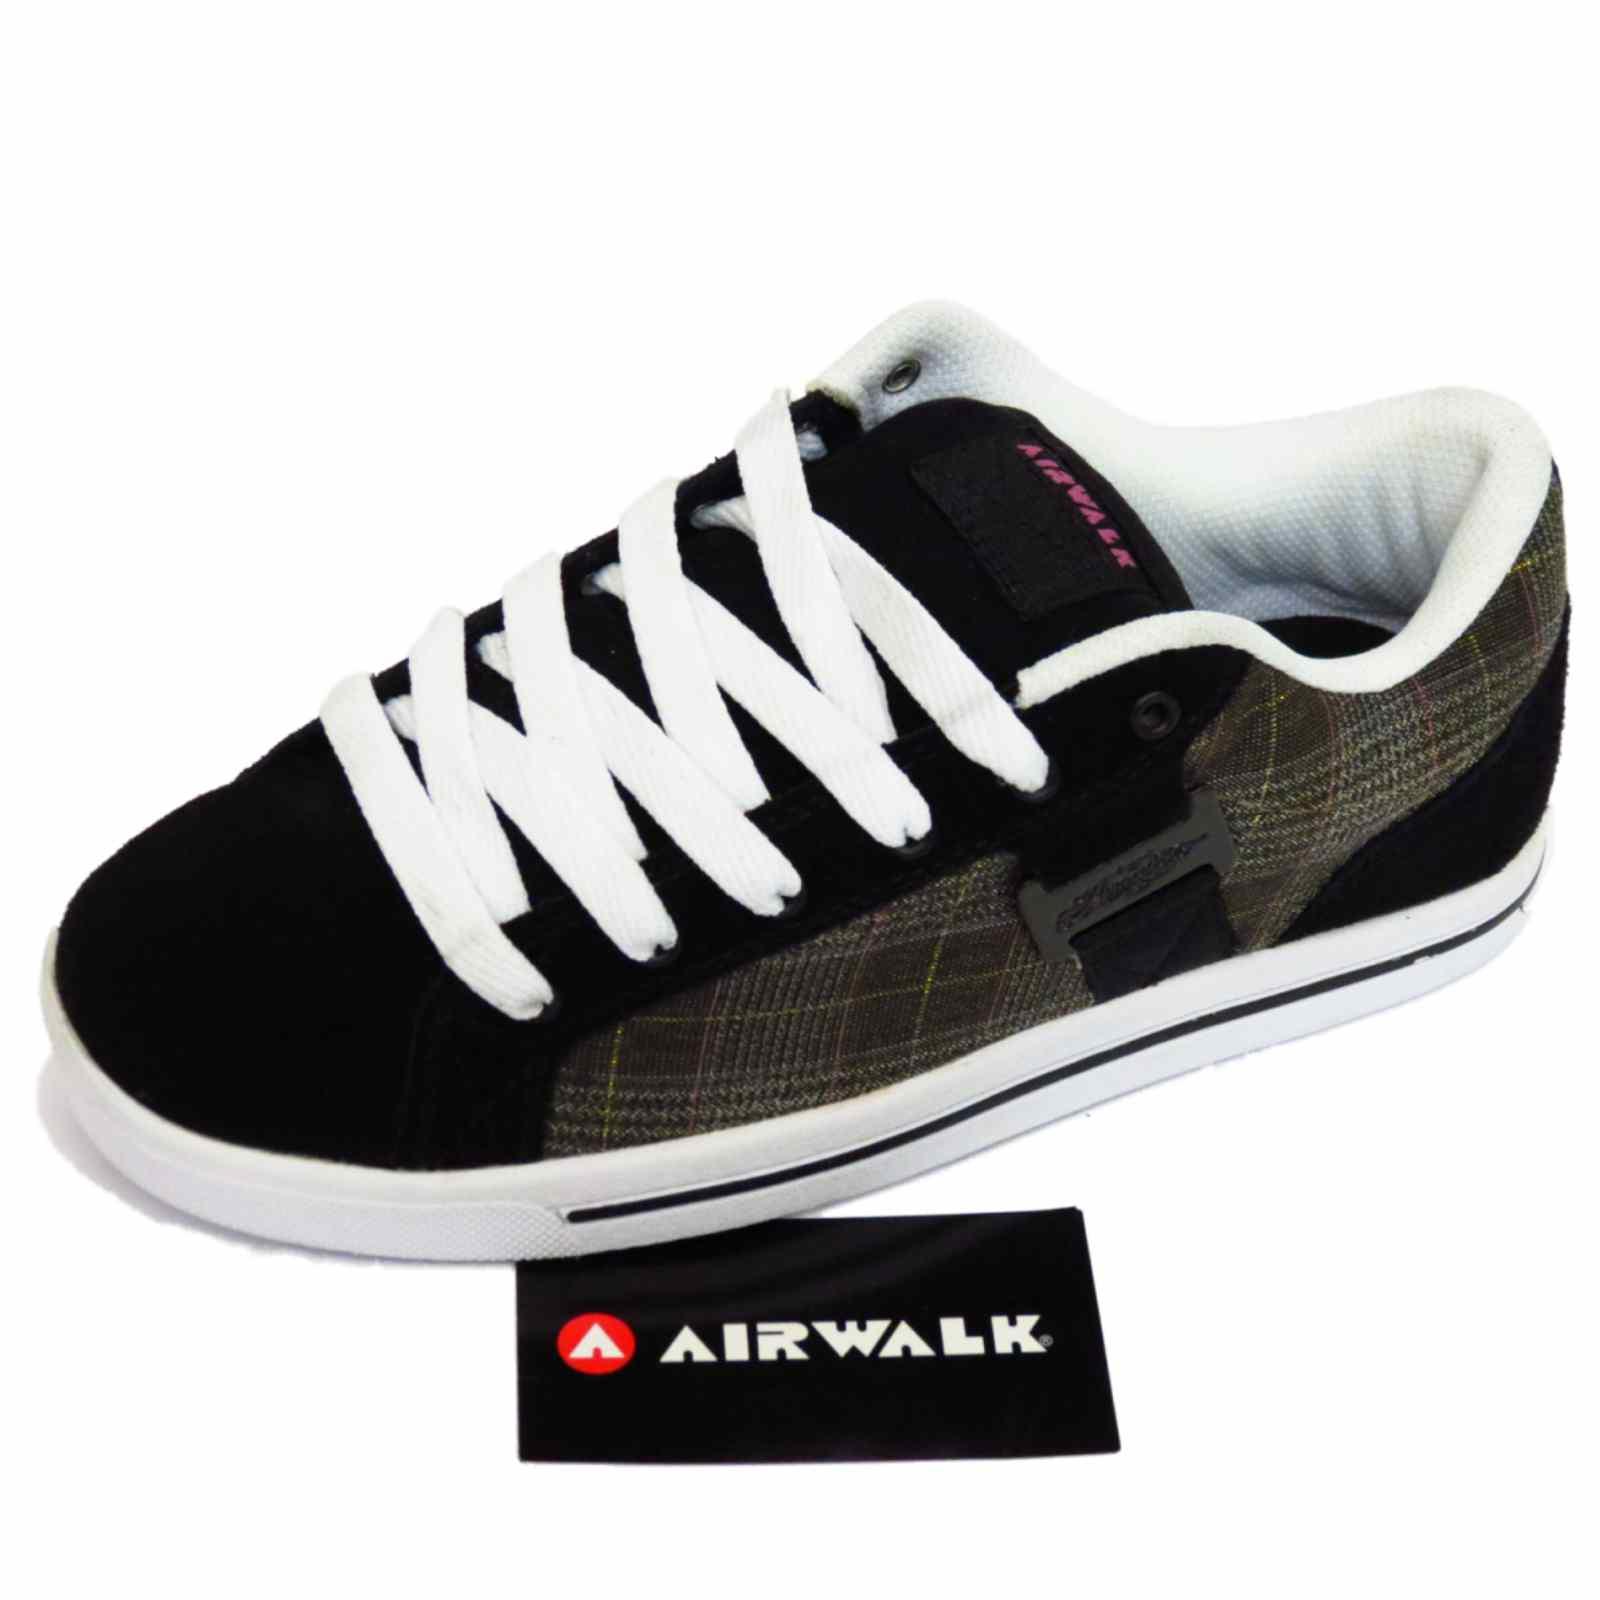 Airwalk Black Leather Shoes